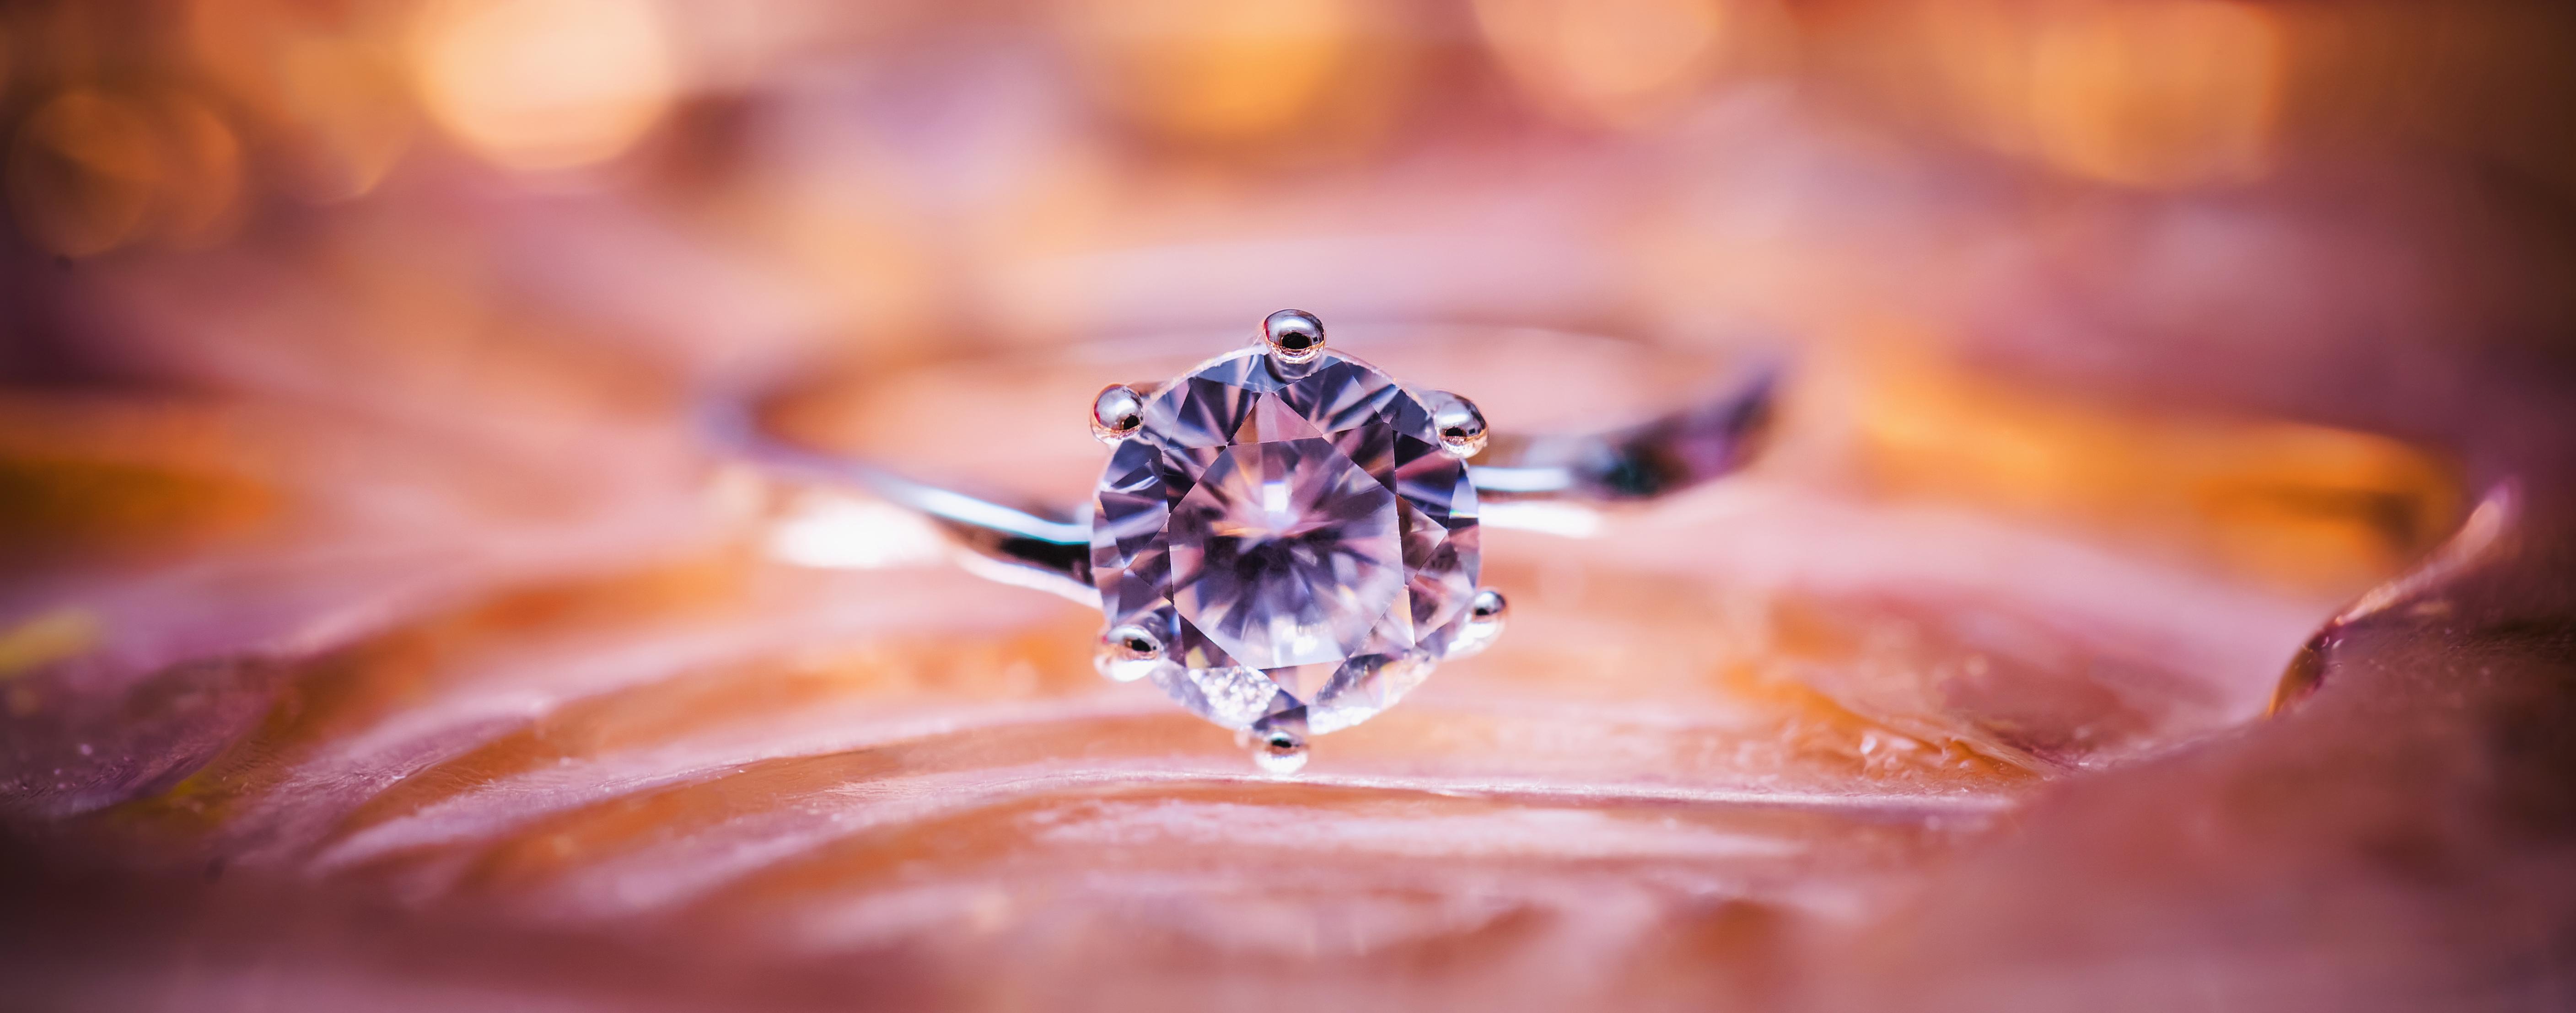 Photography Sunlight Leaf Ring Flower Petal Color Macro Autumn Jewelry Close Up Jewellery Eye Diamond